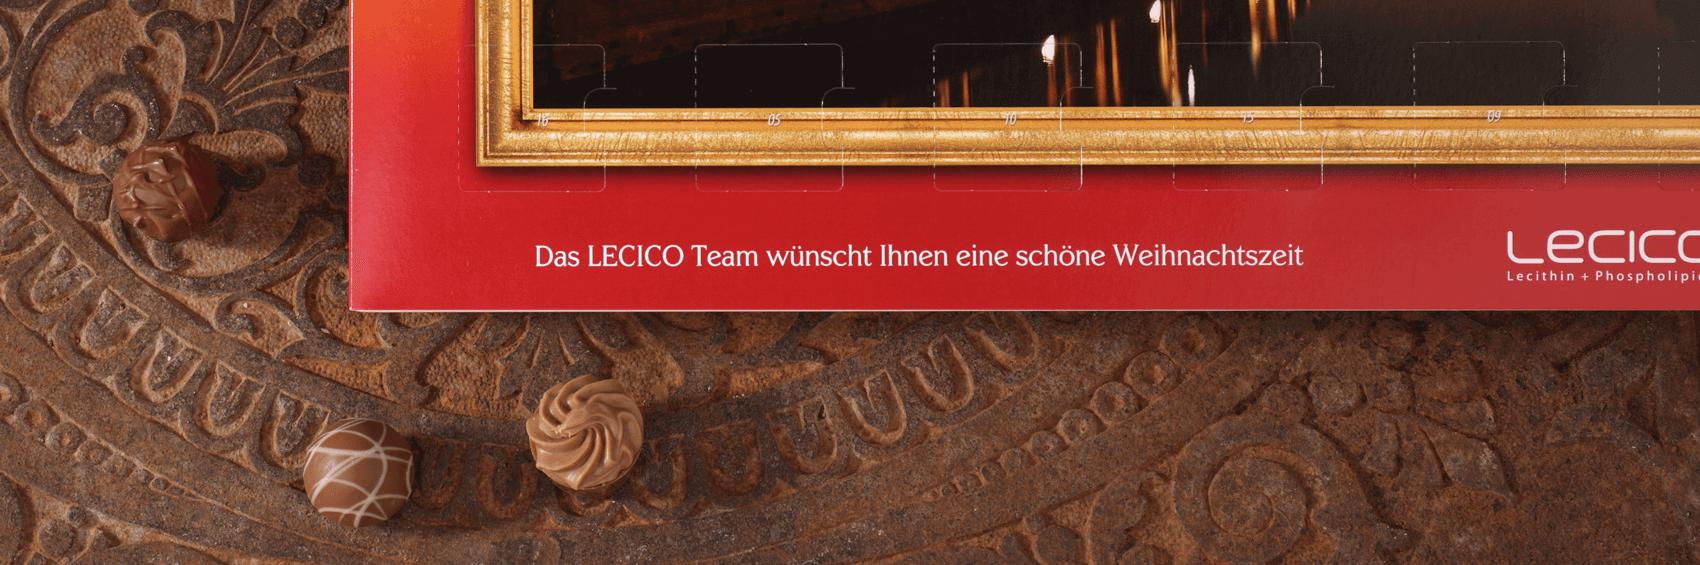 Header_De-Luxe-Grande_Adventskalender_Lecico_individuell_4c_Druck_vinchoc